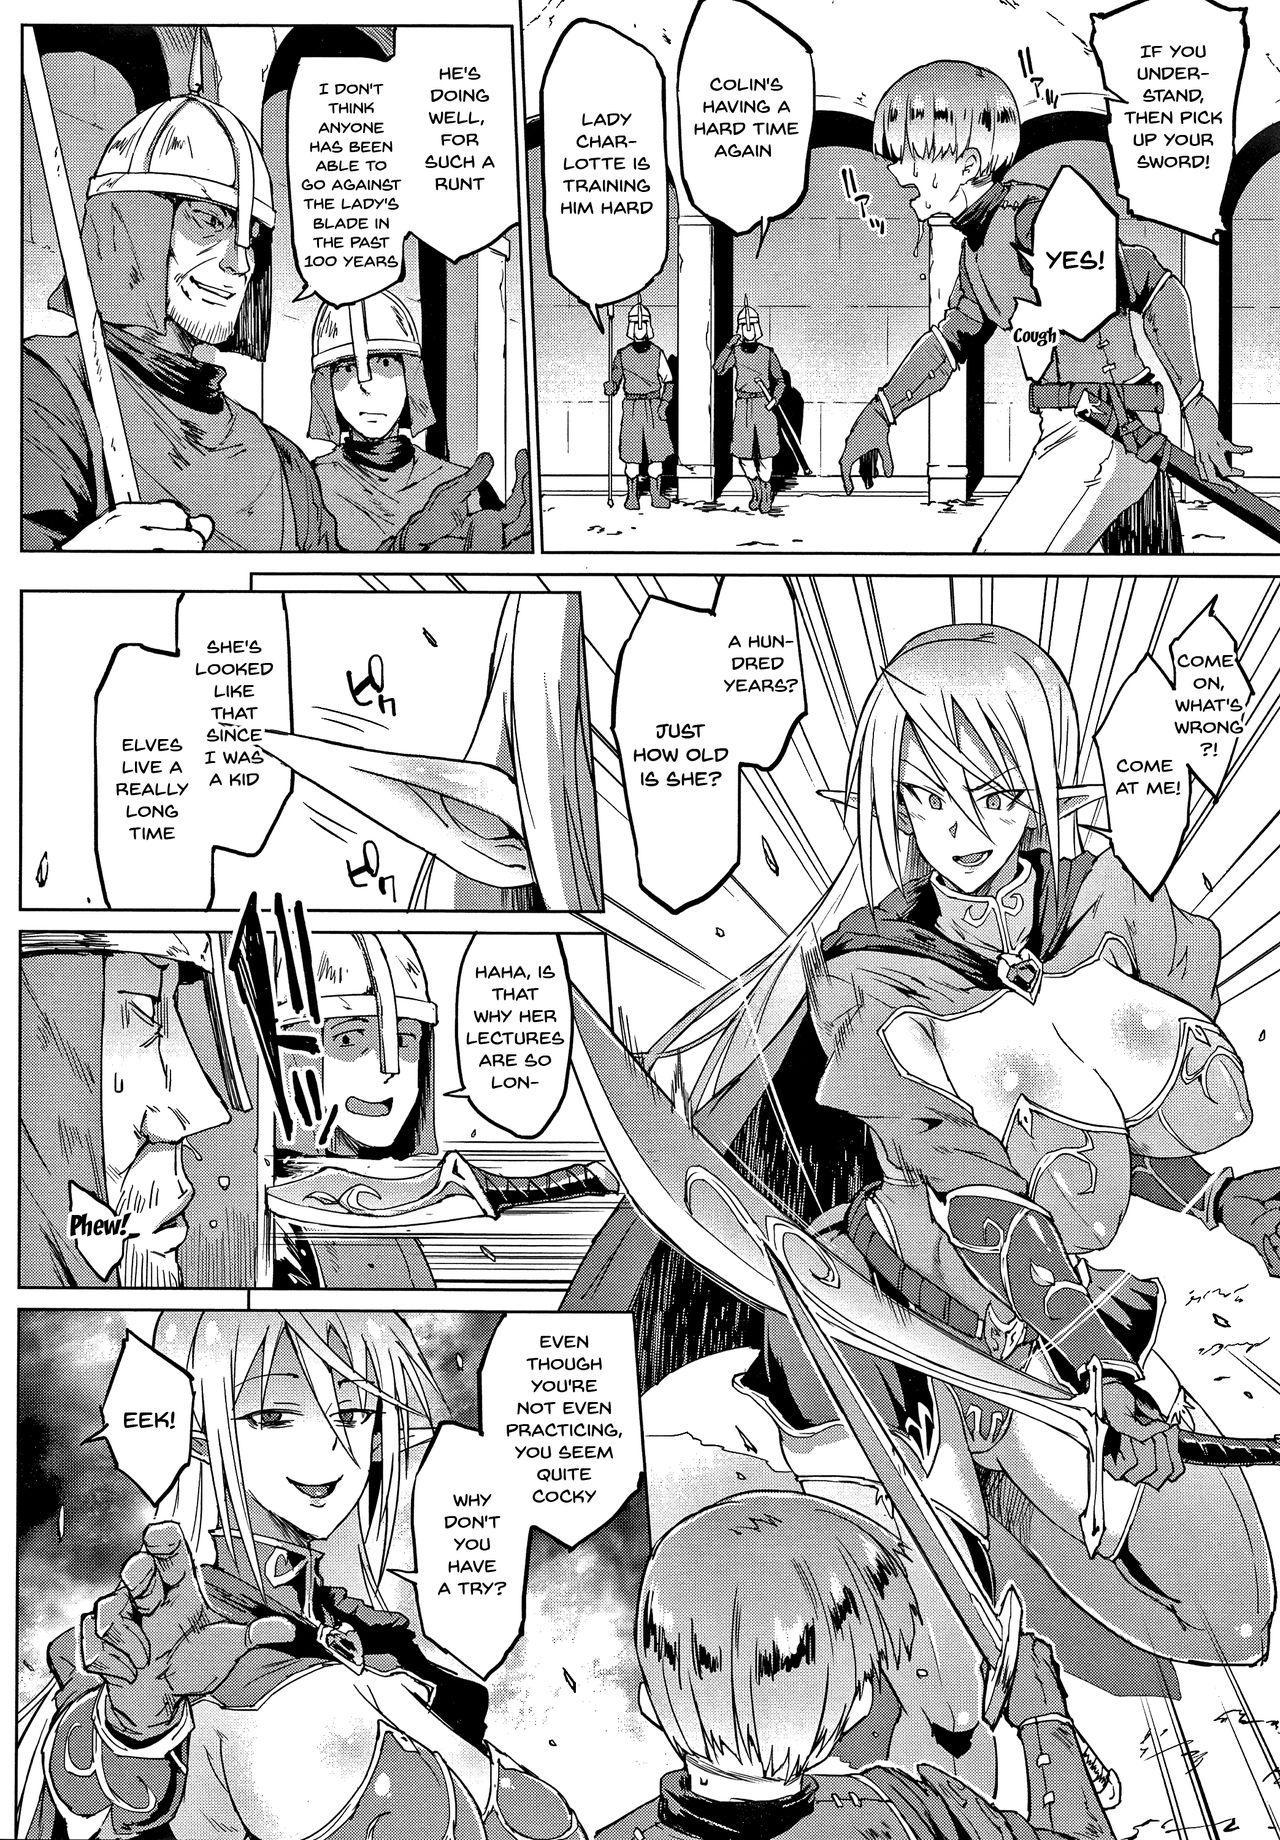 [Fan no Hitori] Sennen Reijou ~ My Lady, My Master ~  Ch.1-3 [English] {Doujins.com} 6